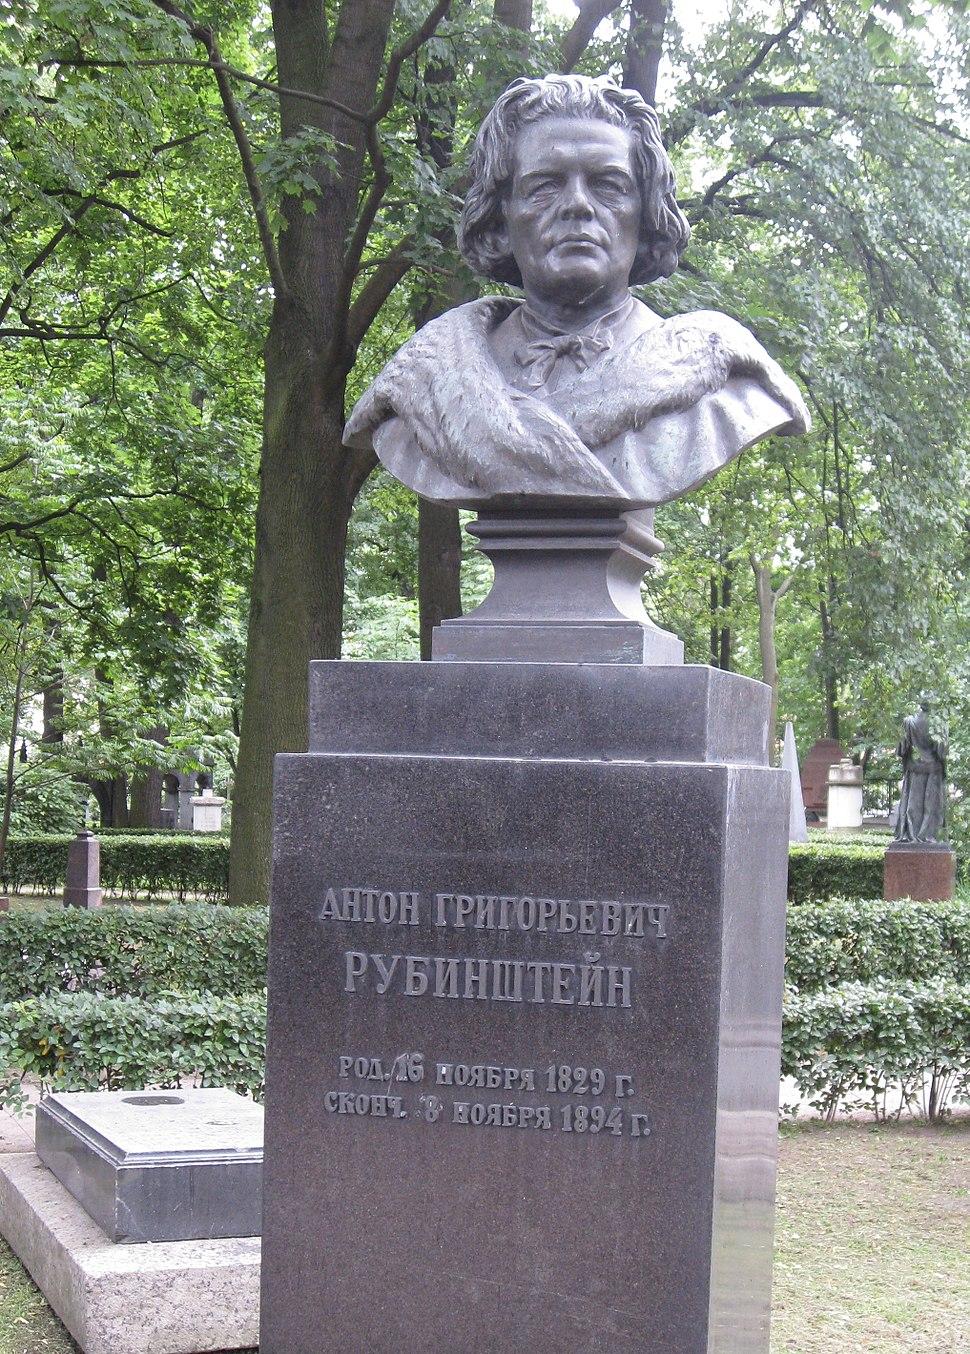 Anton Rubinstein headstone in Tikhvin Cemetery